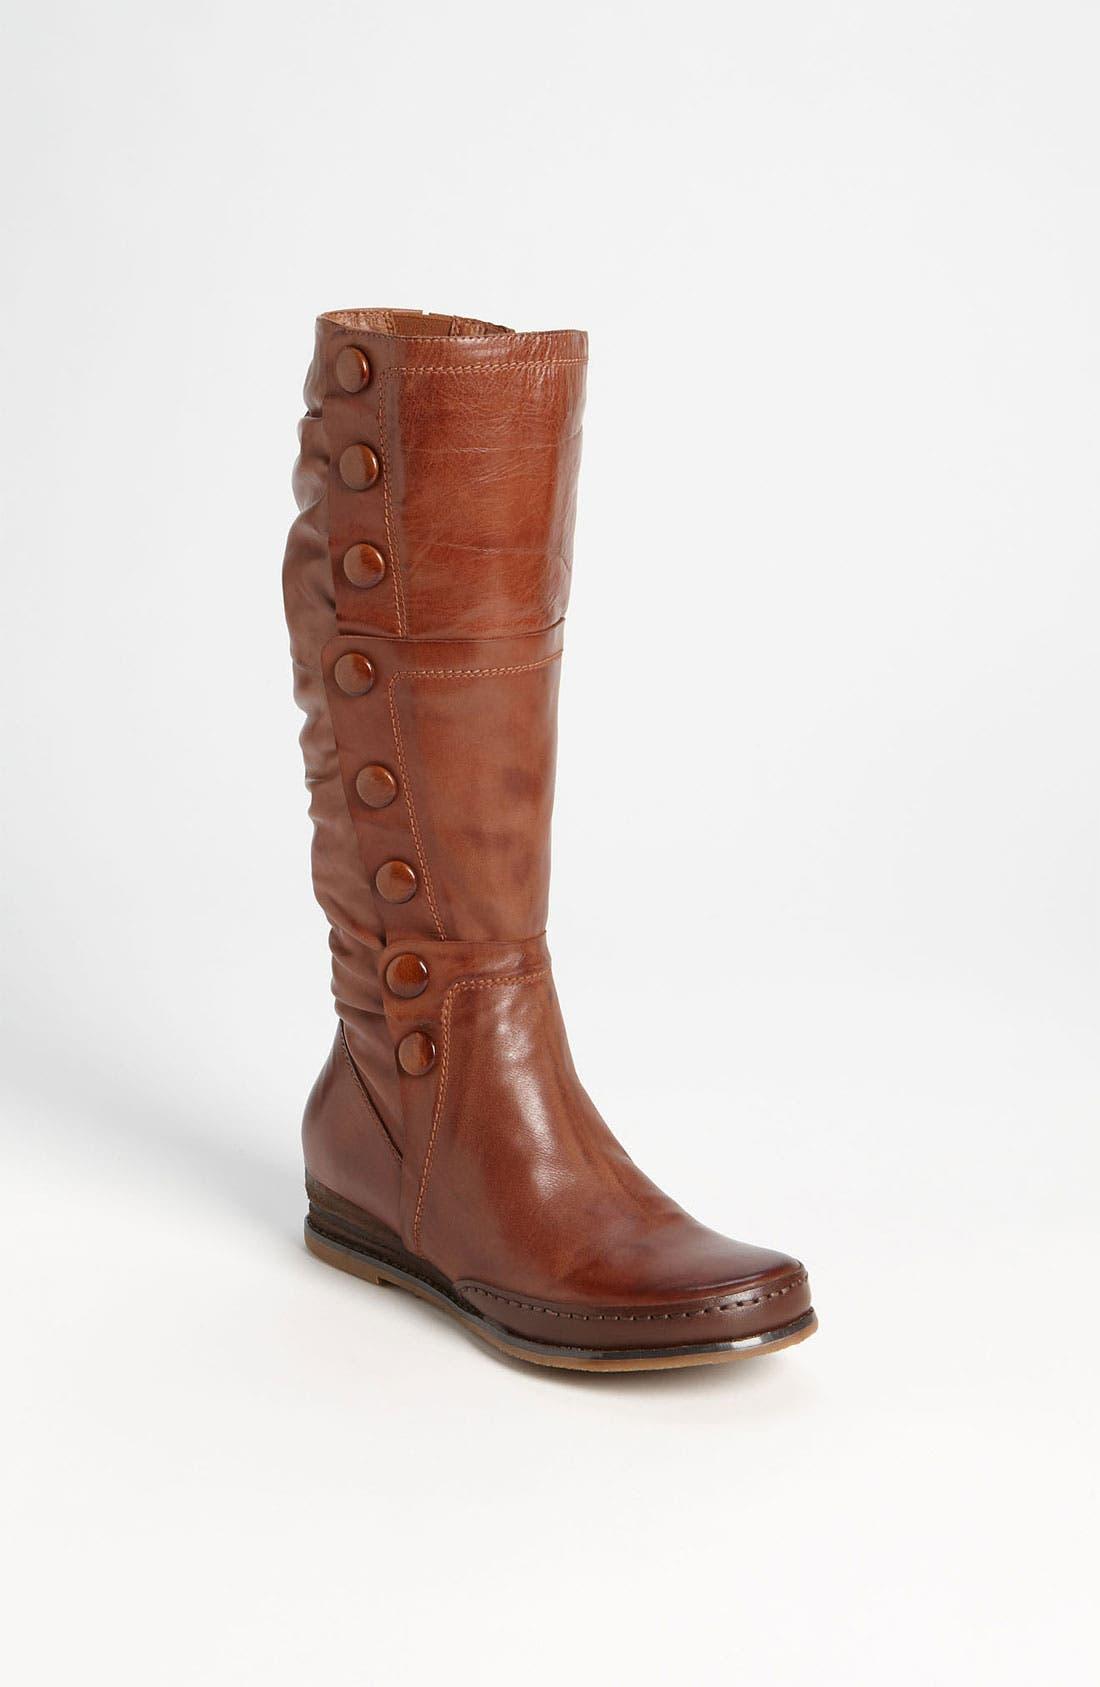 Alternate Image 1 Selected - Miz Mooz 'Paz' Boot